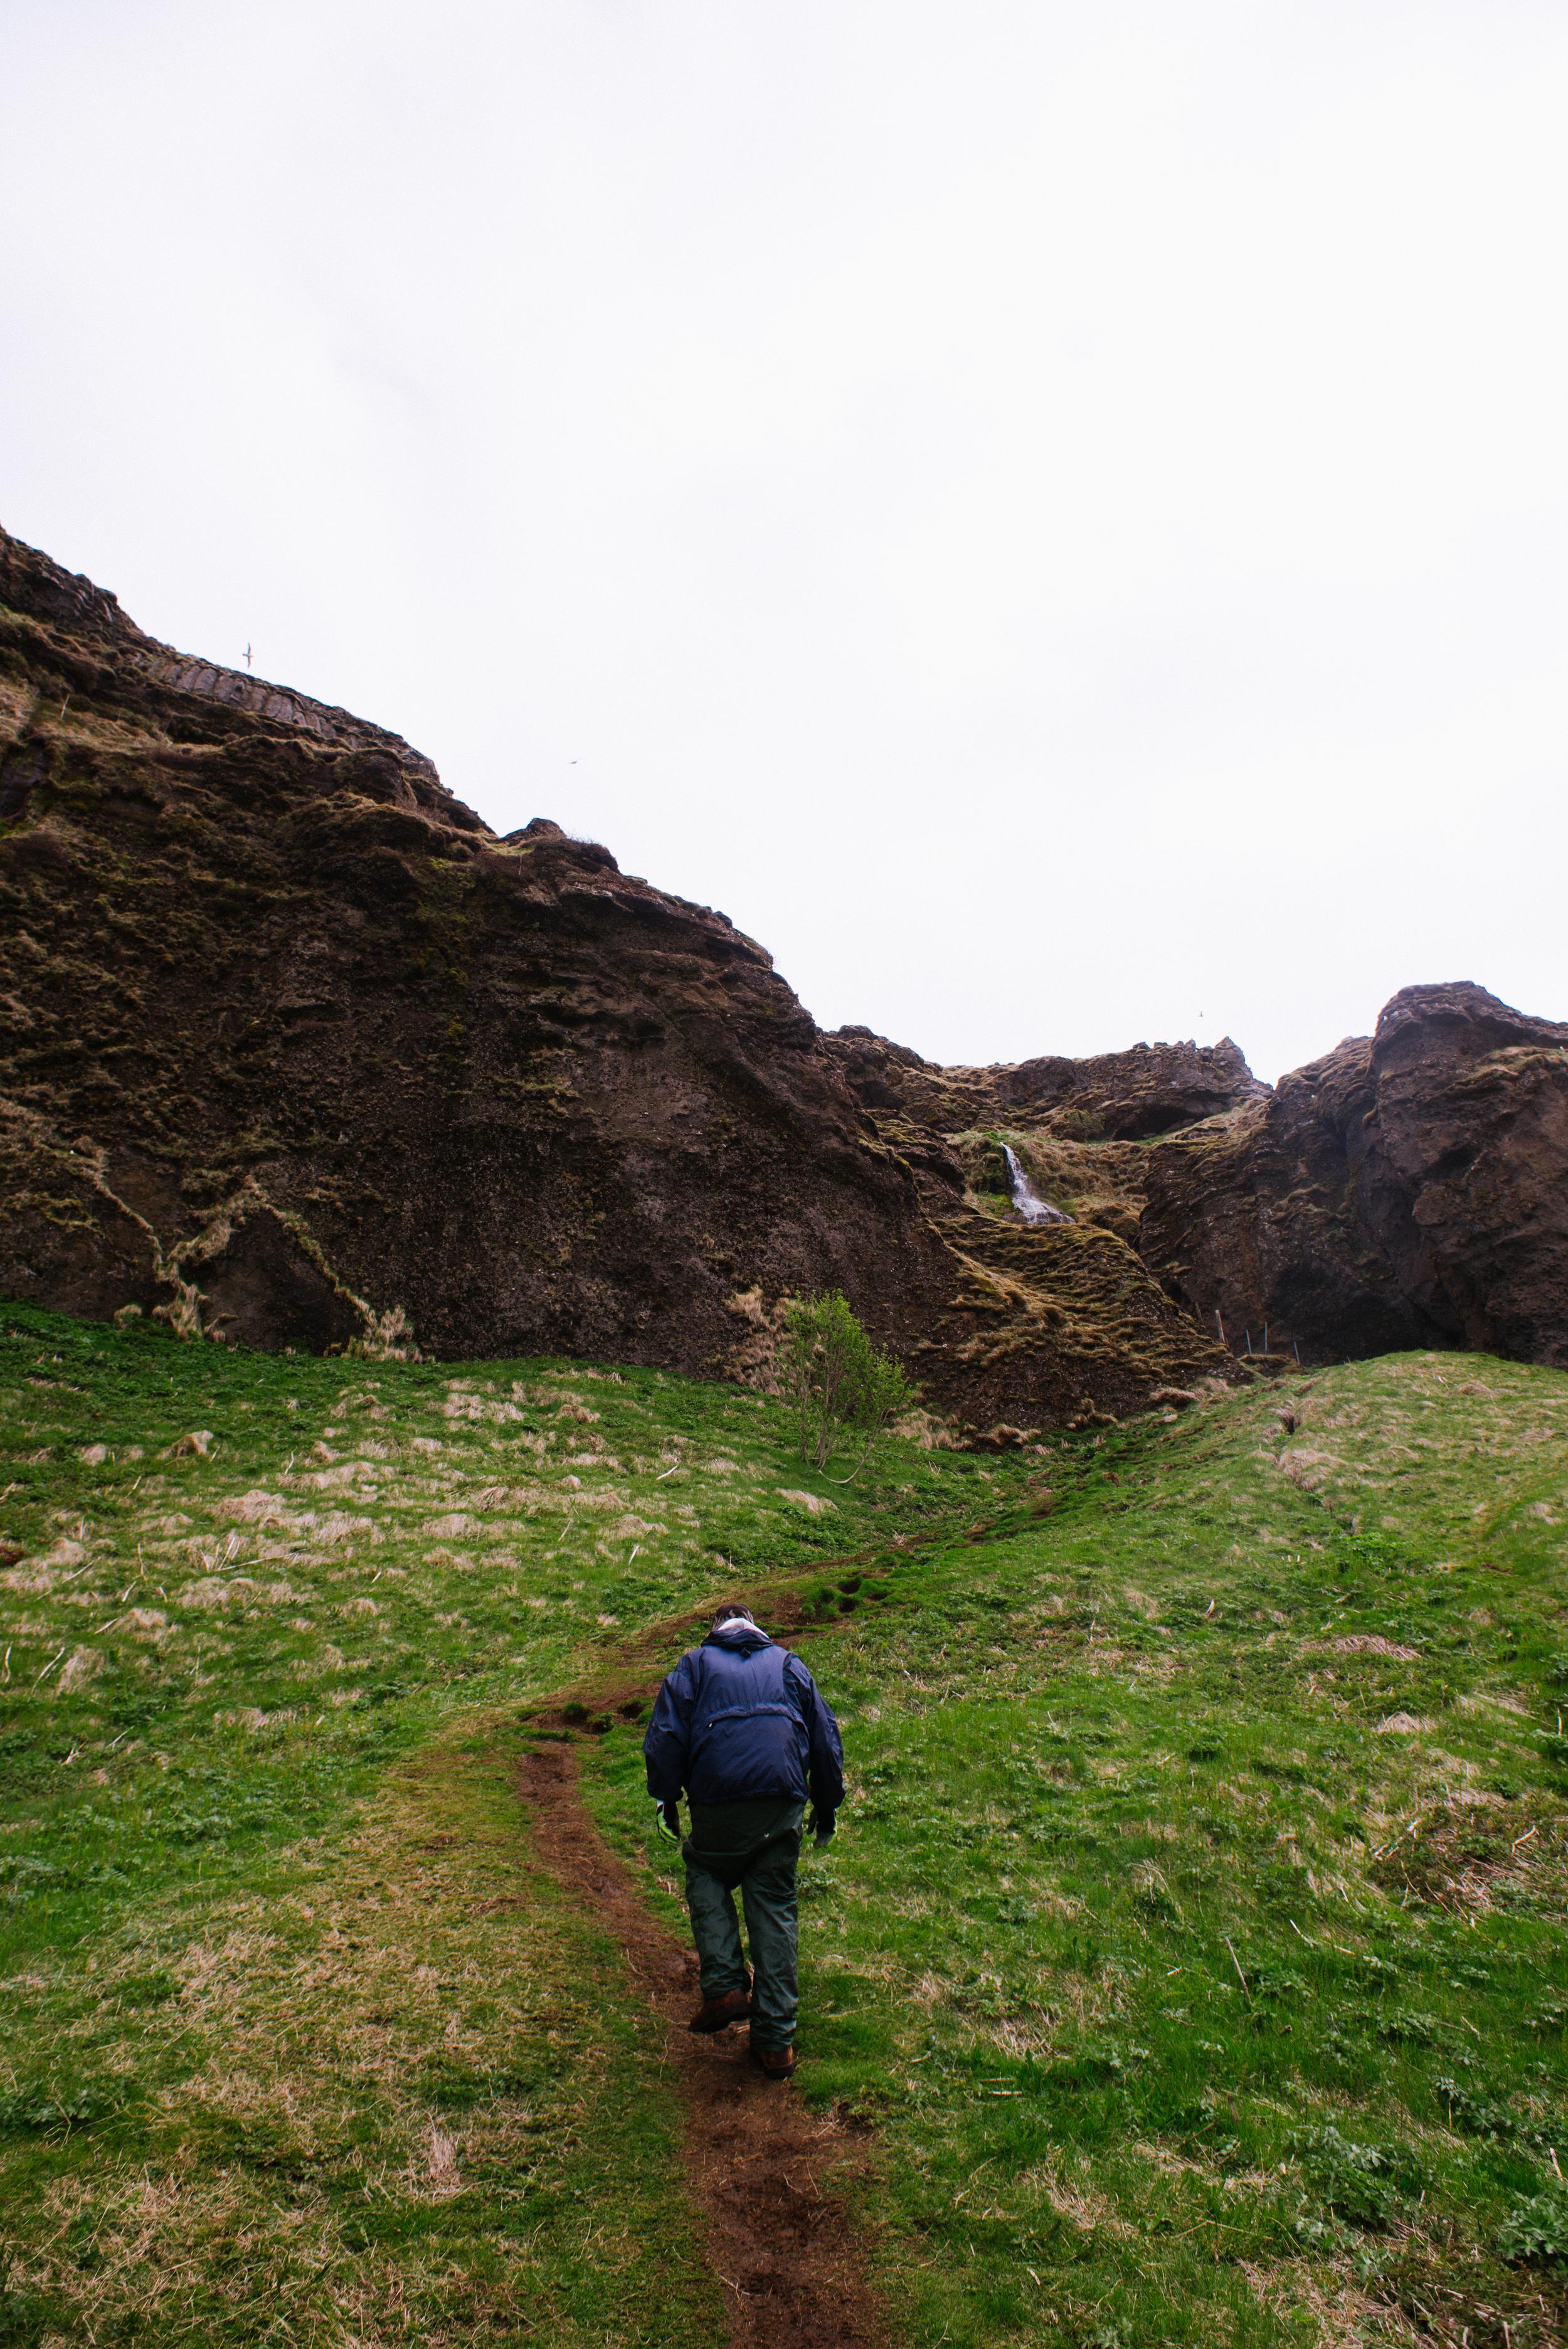 Iceland 2015 - HighRes-11.JPG